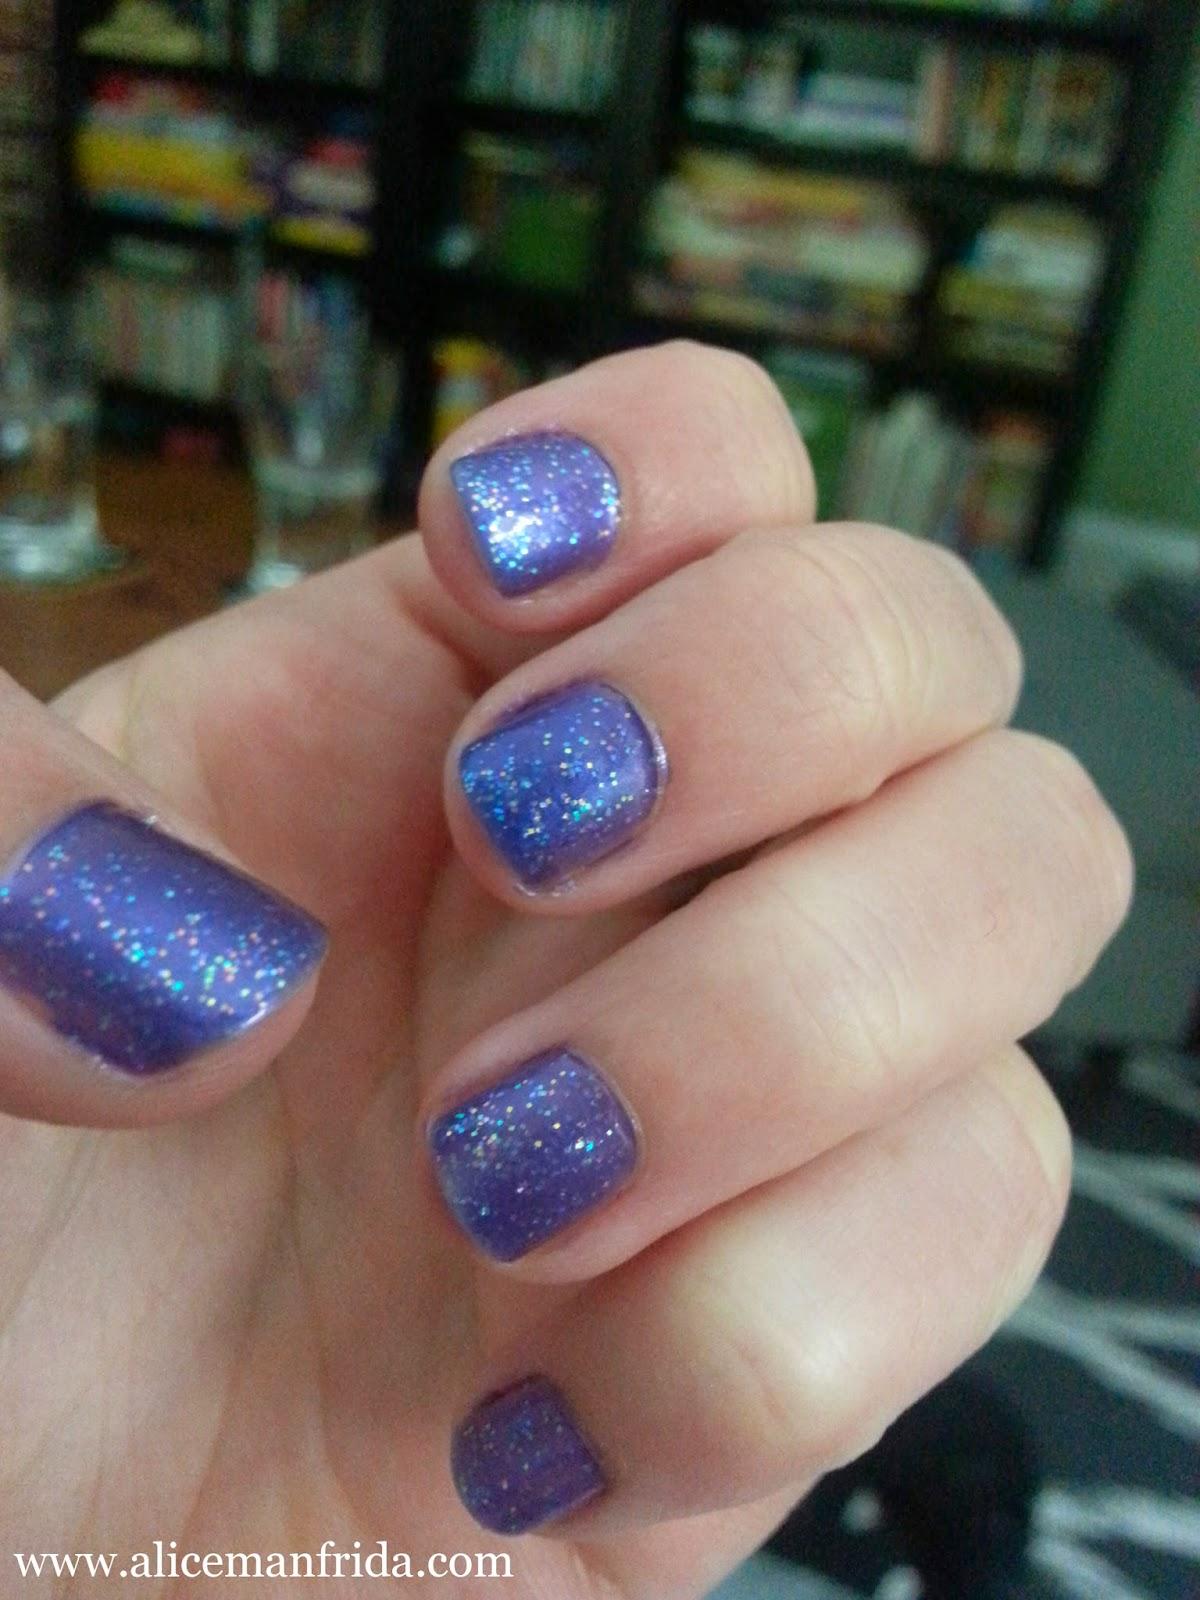 SinfulColors, WetnWild, nailpolish, purple, glitter, hallucinate, Fiji,nails, manicure, AliceManfrida, Alice Manfrida